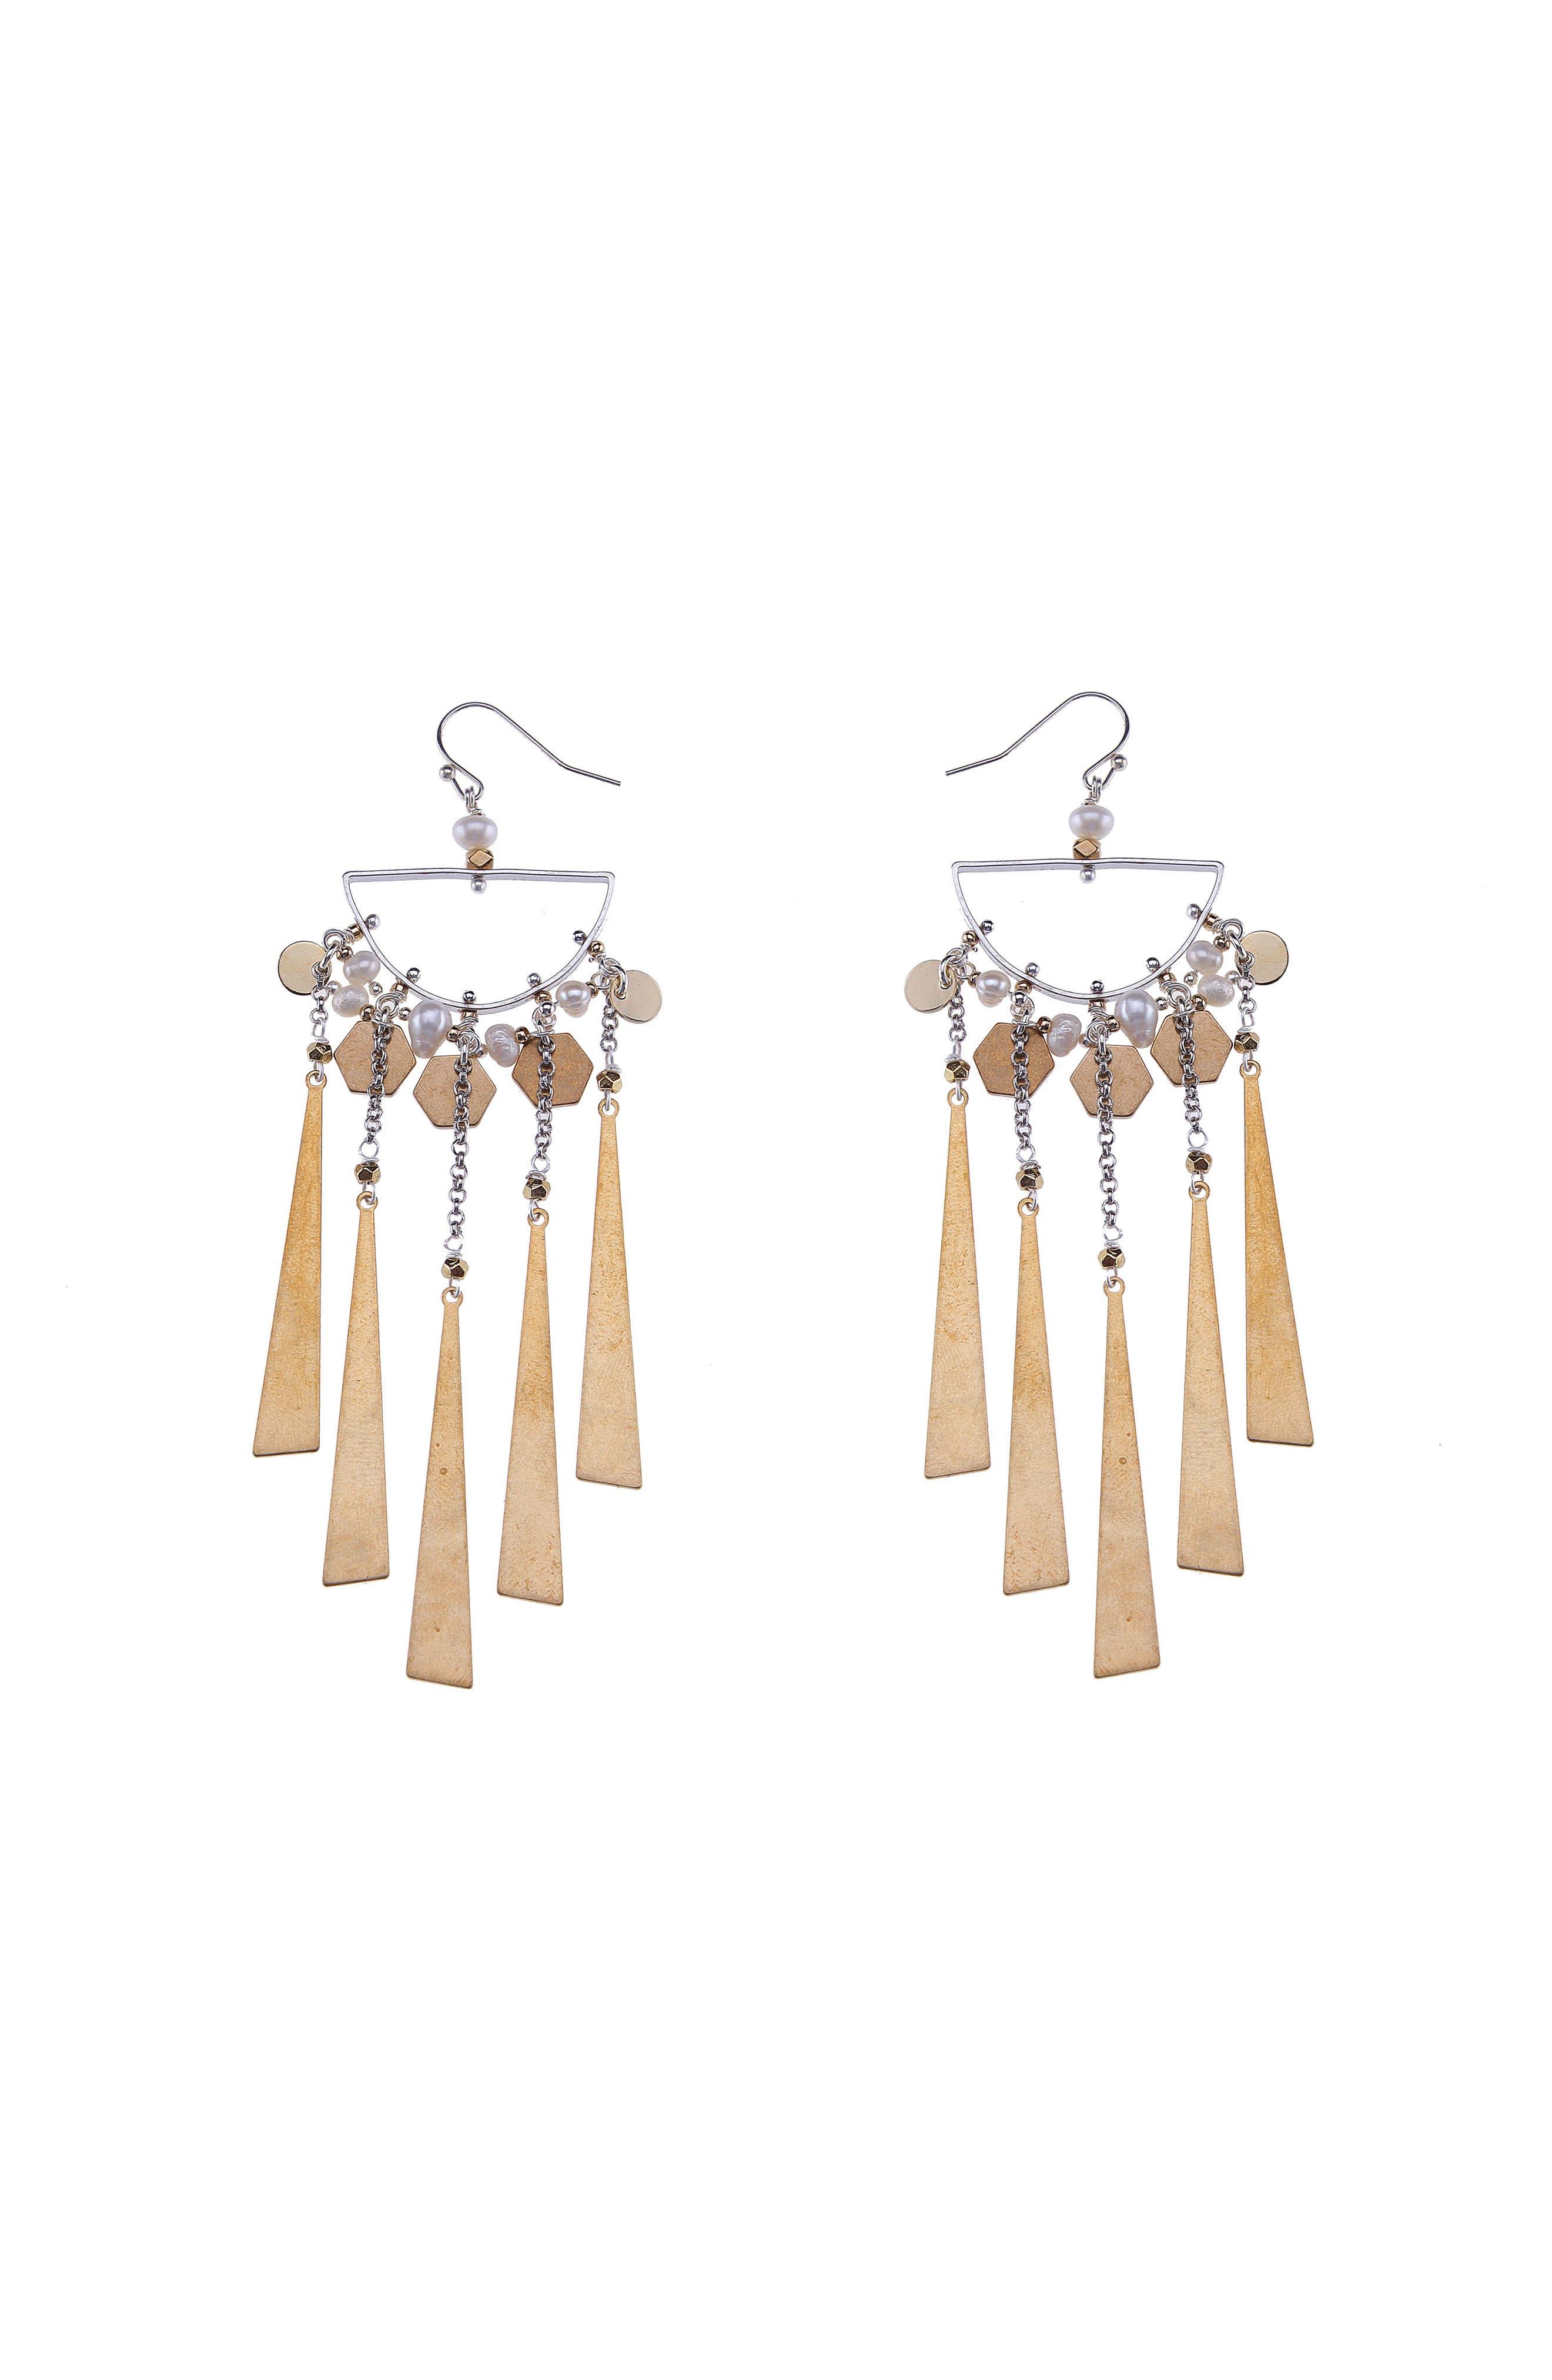 Freshwater Pearl & Metal Fringe Statement Earrings,                             Main thumbnail 1, color,                             710